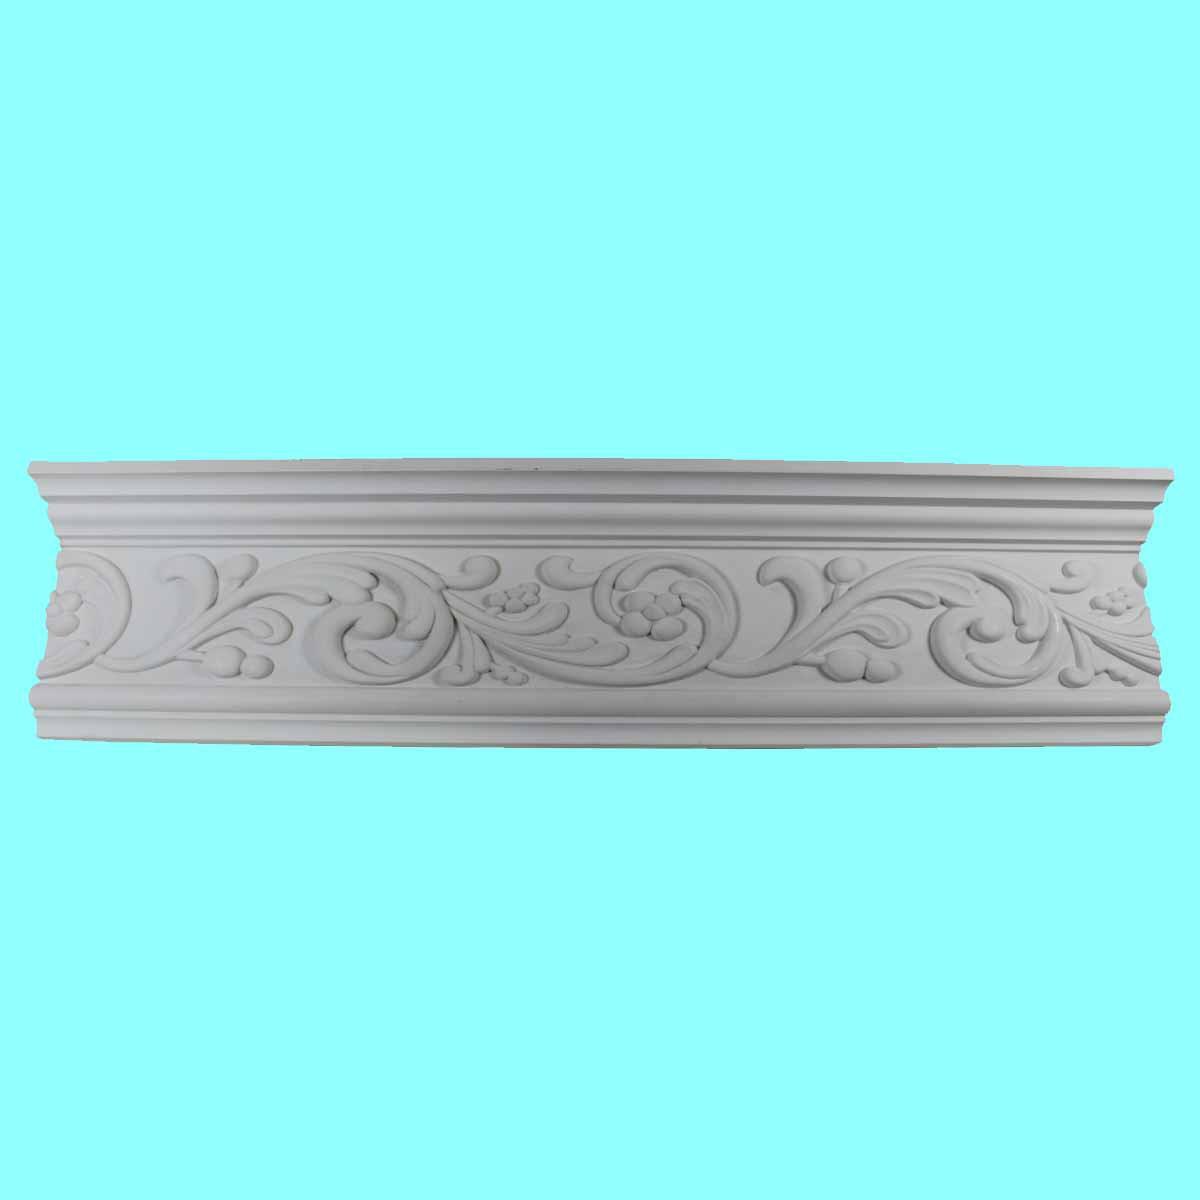 Cornice White Urethane Sample of 12369 24 Cornice Cornice Moulding Cornice Molding